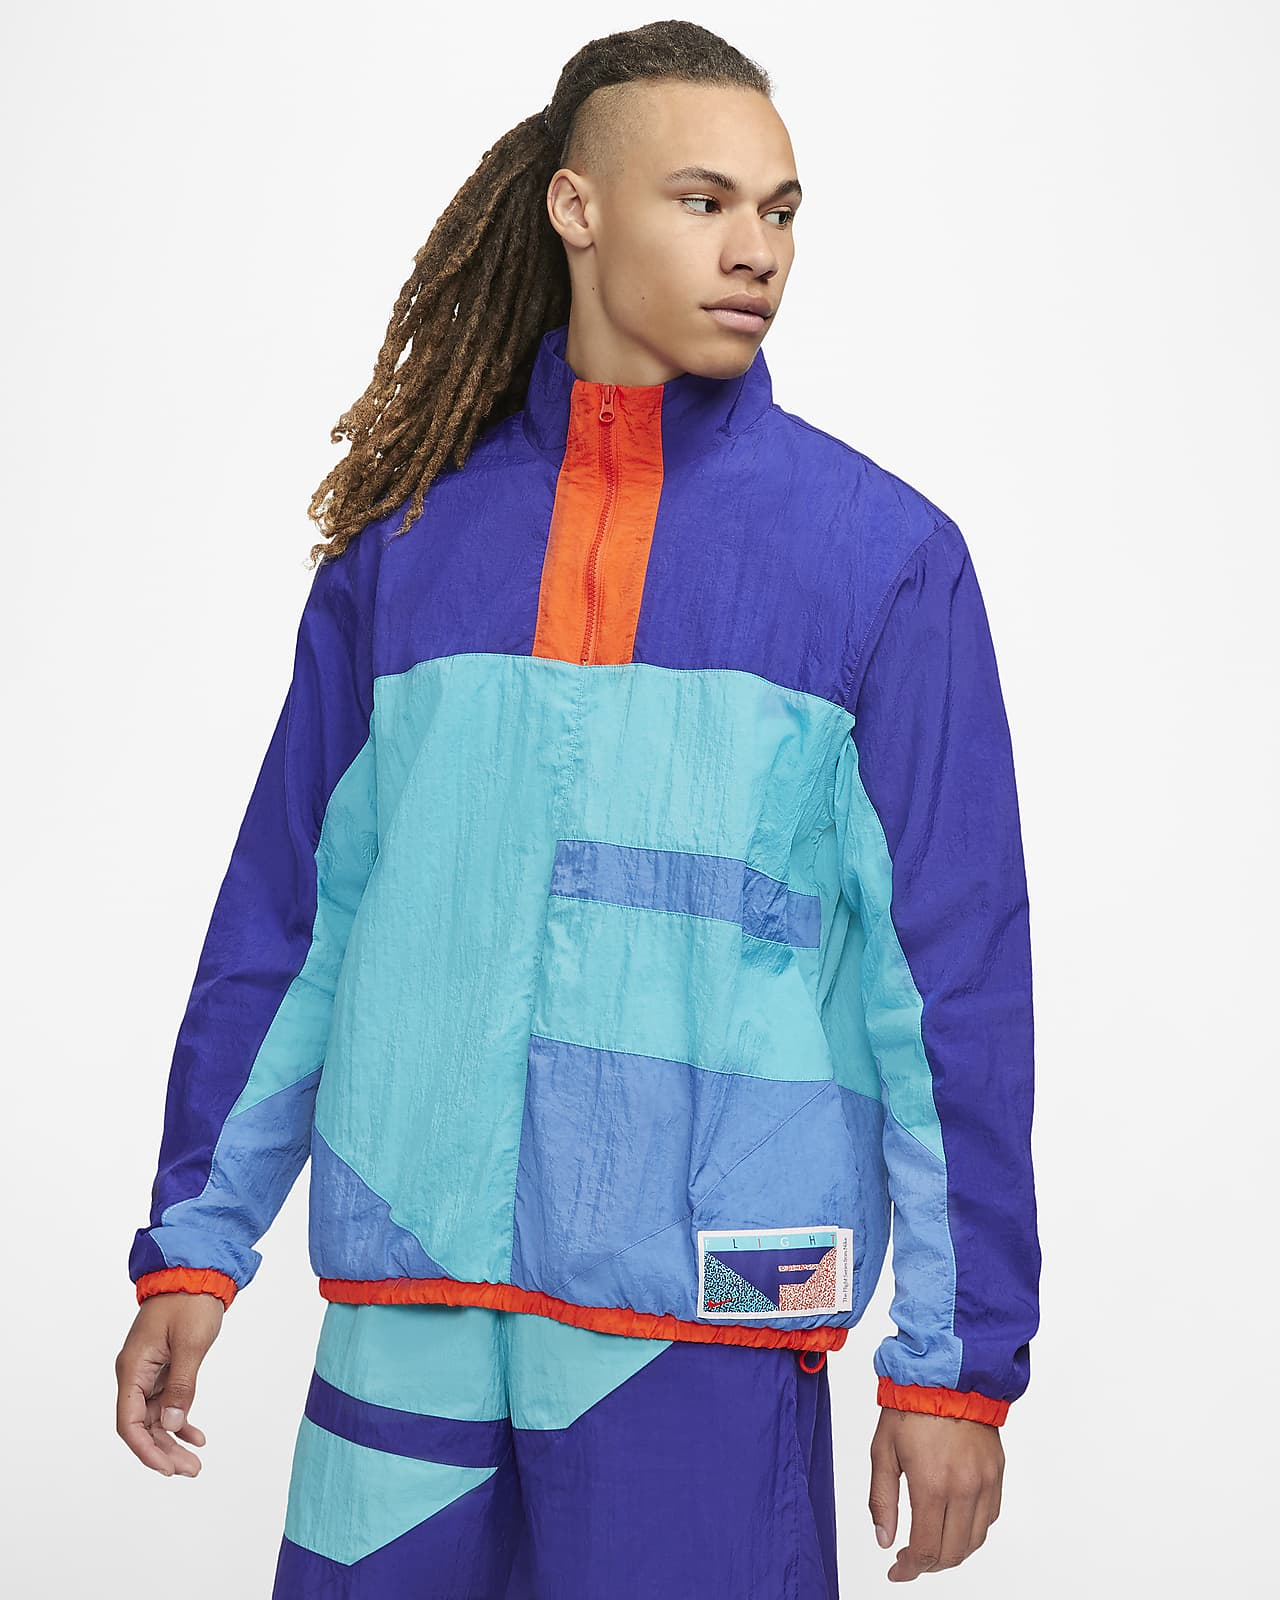 Nike Flight Basketball Jacket